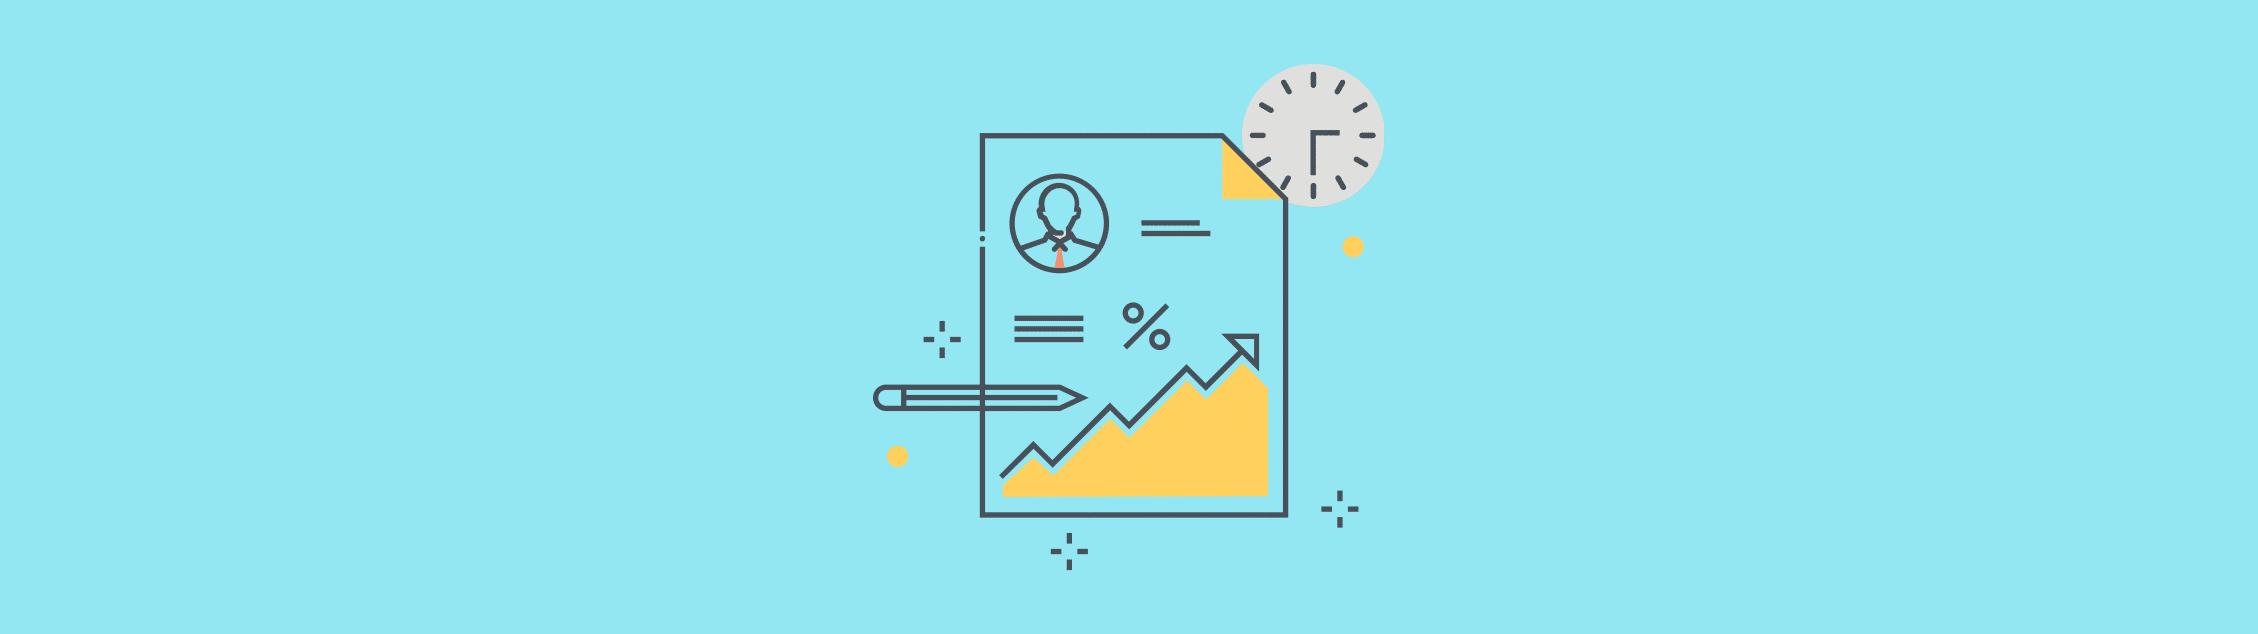 10 Employee Engagement Ideas That Get Serious Results Smart Goals Template